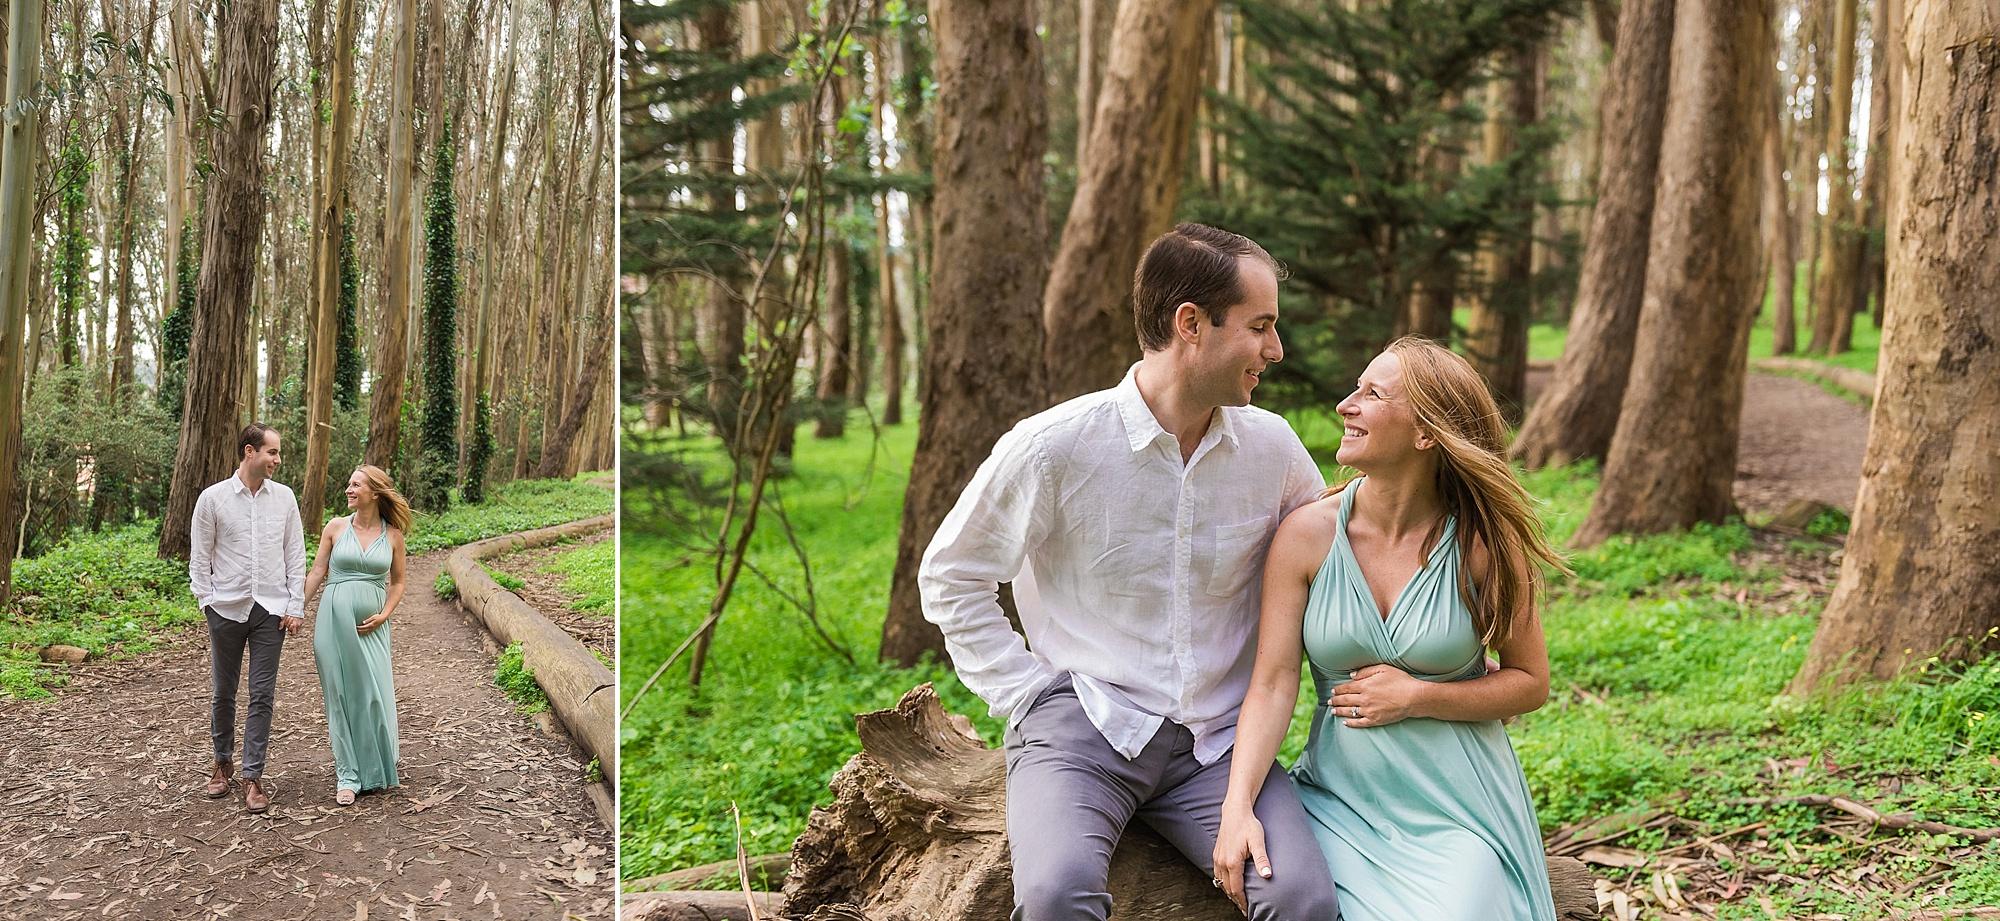 Presidio Wood Line maternity photography